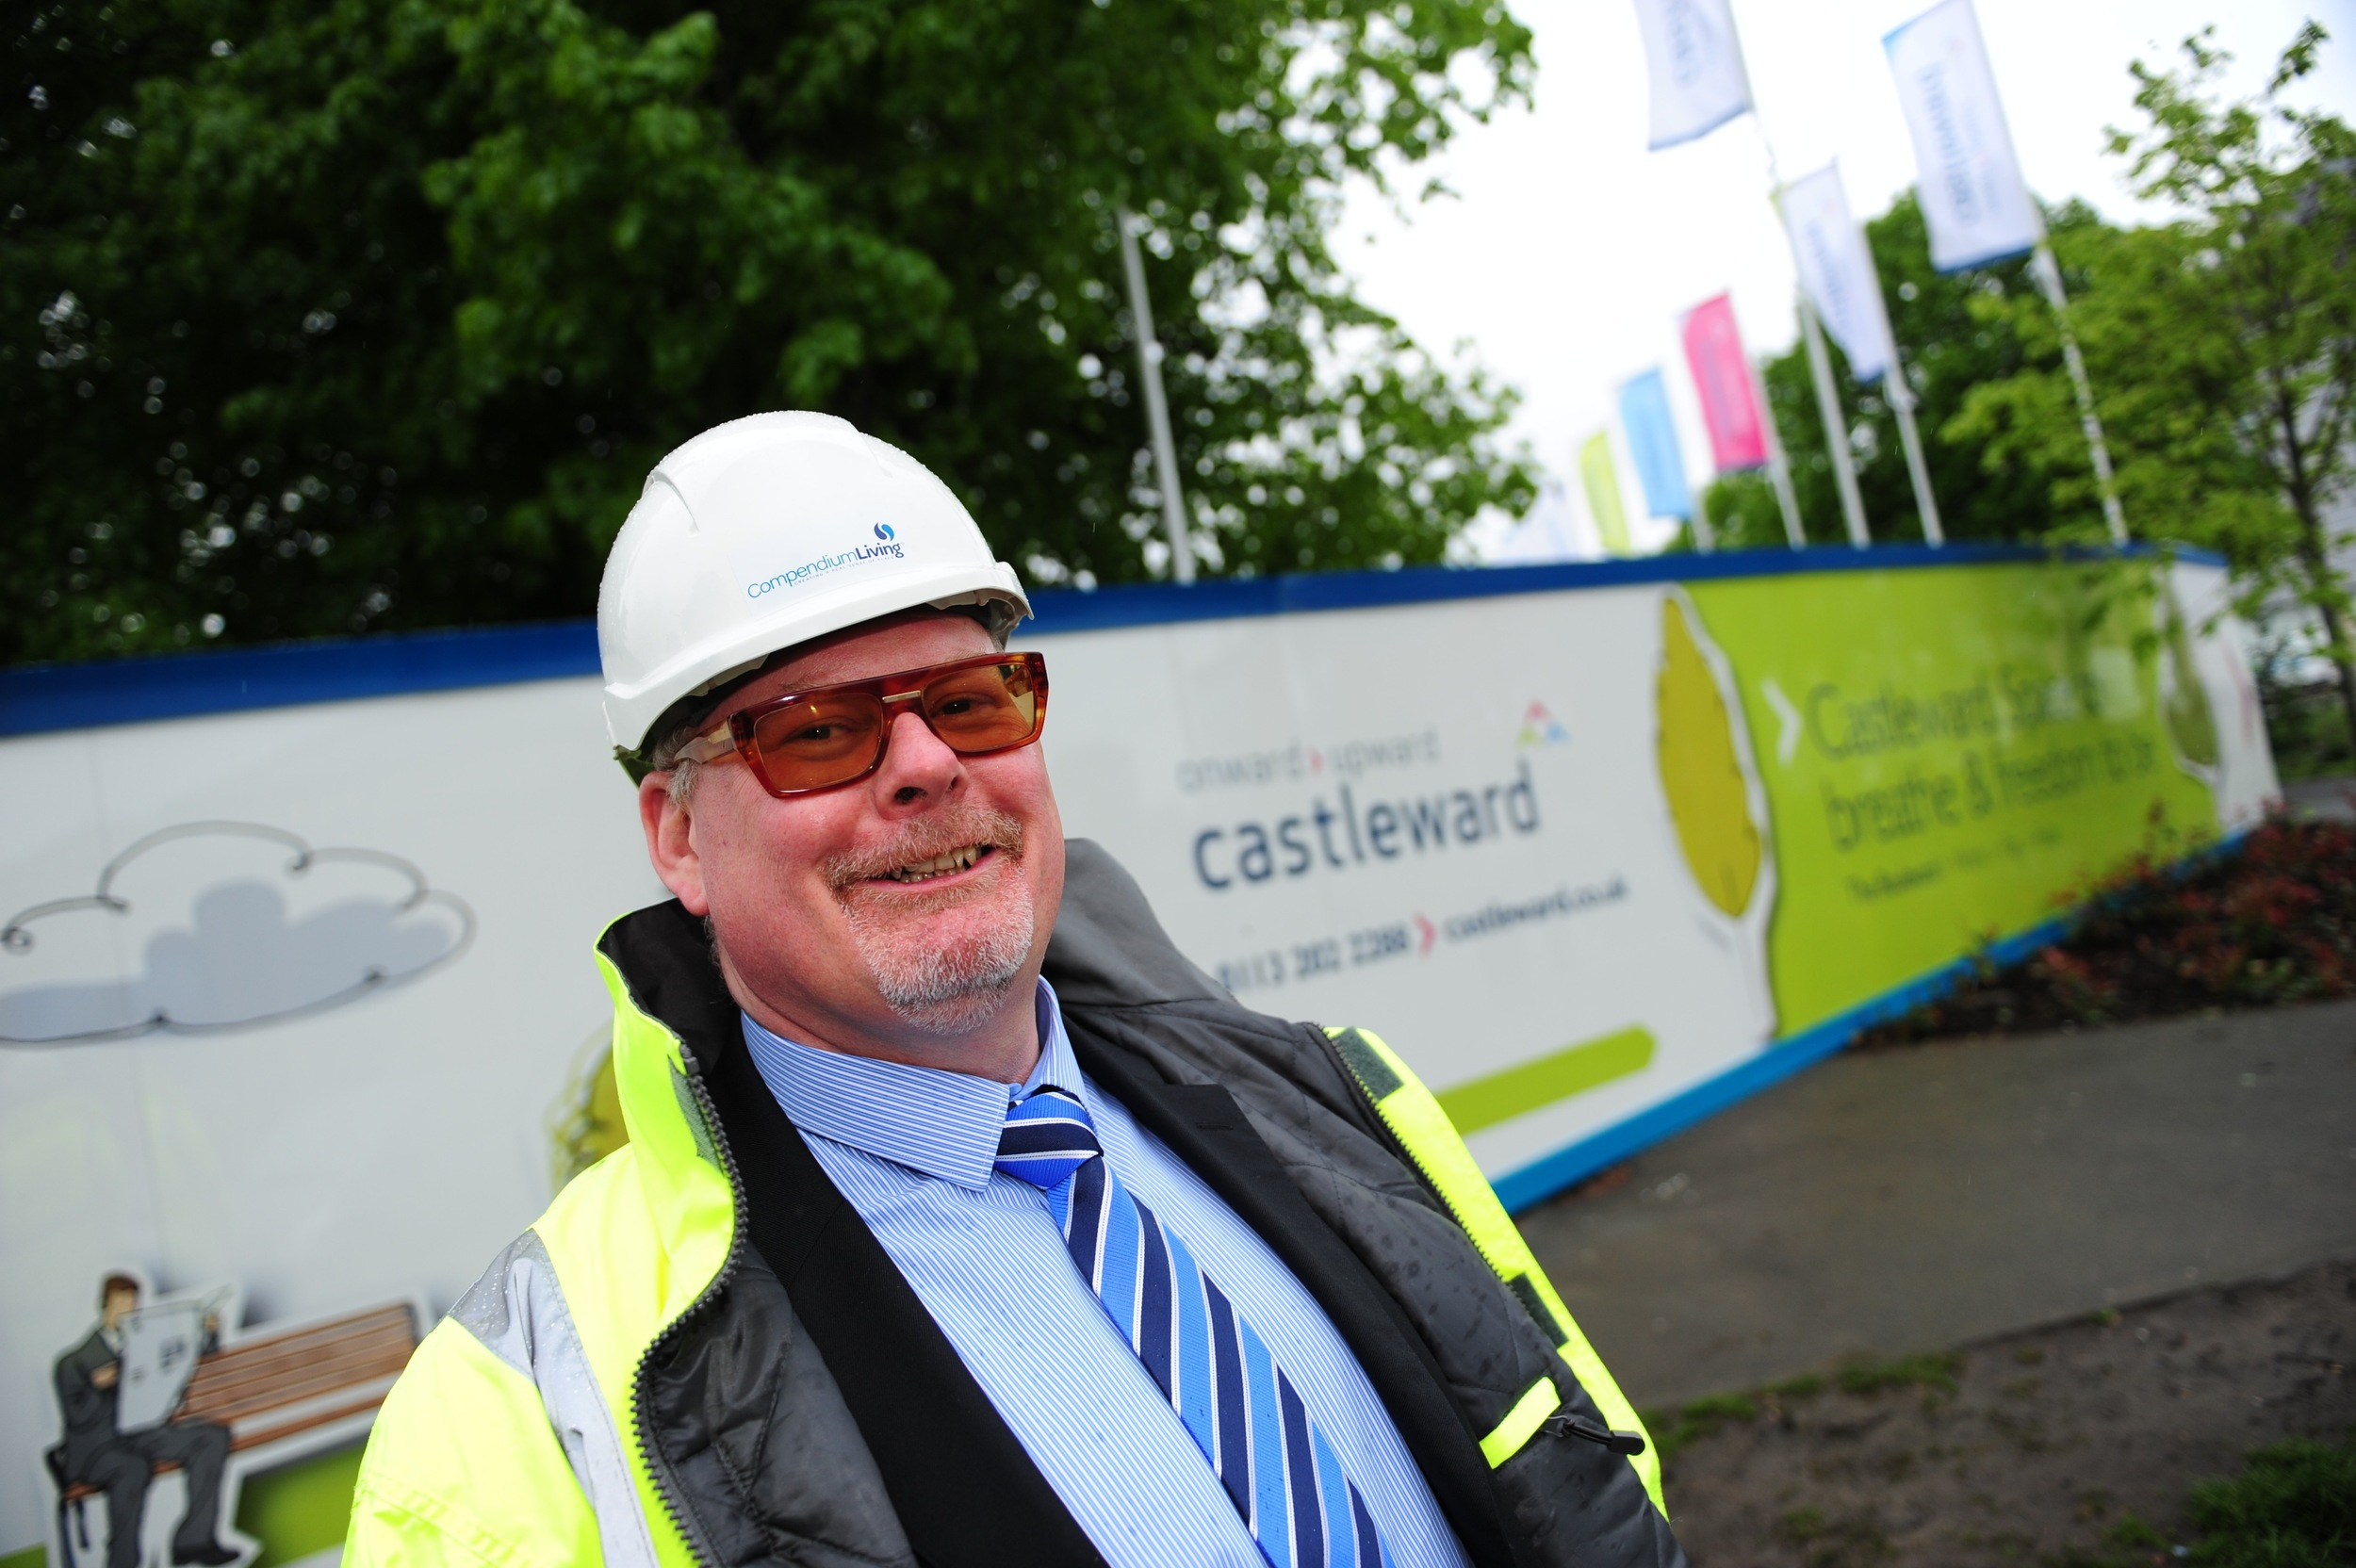 Dave Bullock, Managing Director of Bondholder Compendium Living standing outside the Castleward development